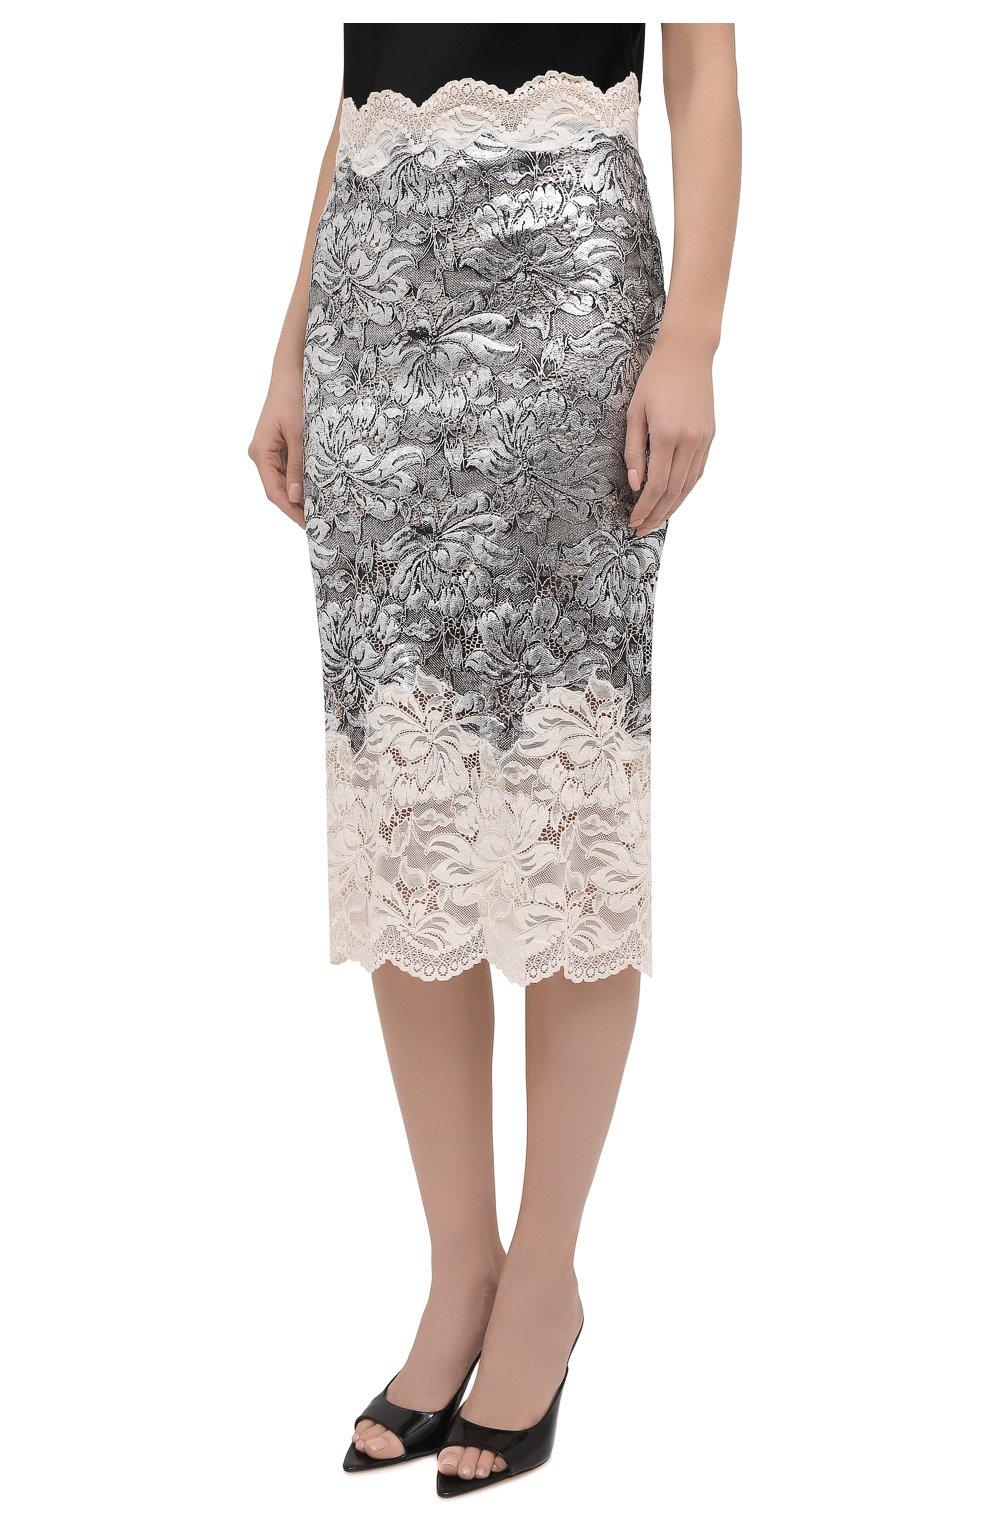 Женская юбка PACO RABANNE серебряного цвета, арт. 21EJJU201PA0173 | Фото 3